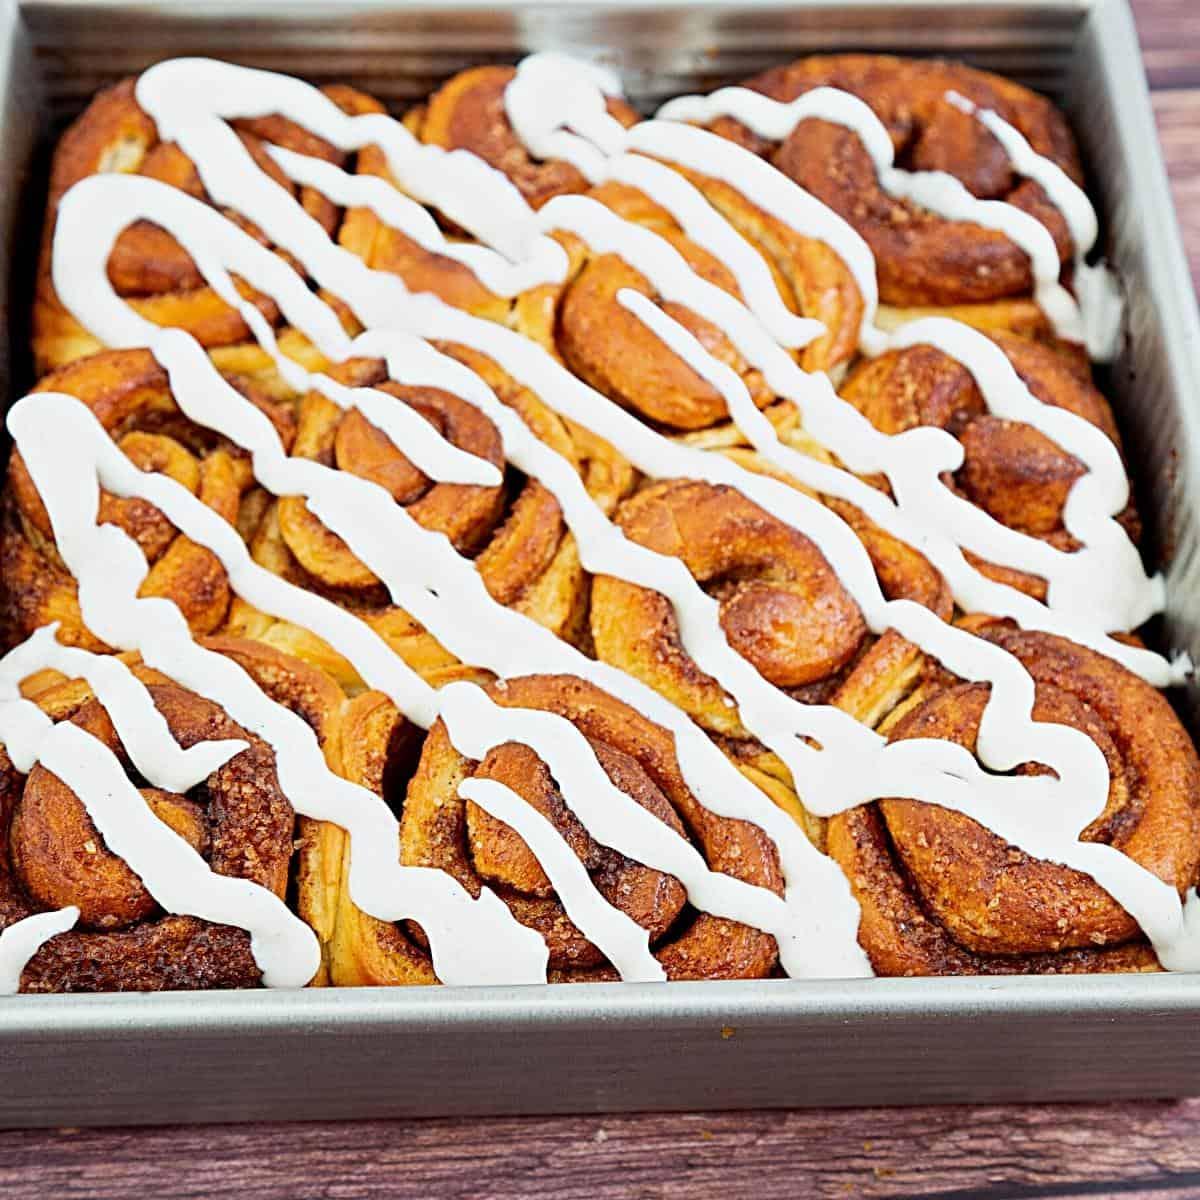 A baking pan with glaze cinnamon rolls.